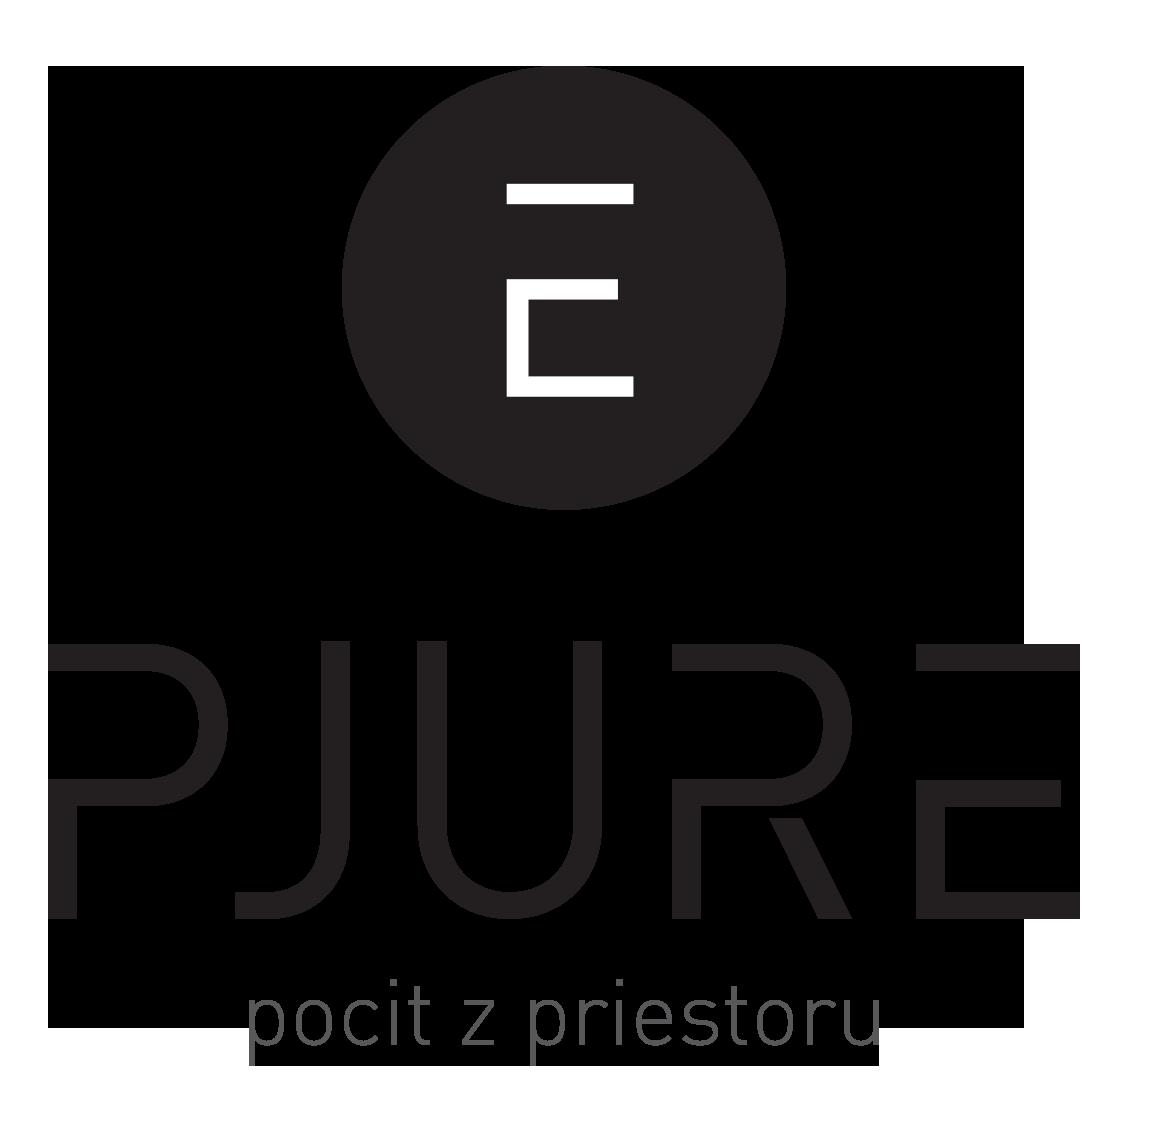 PJURE